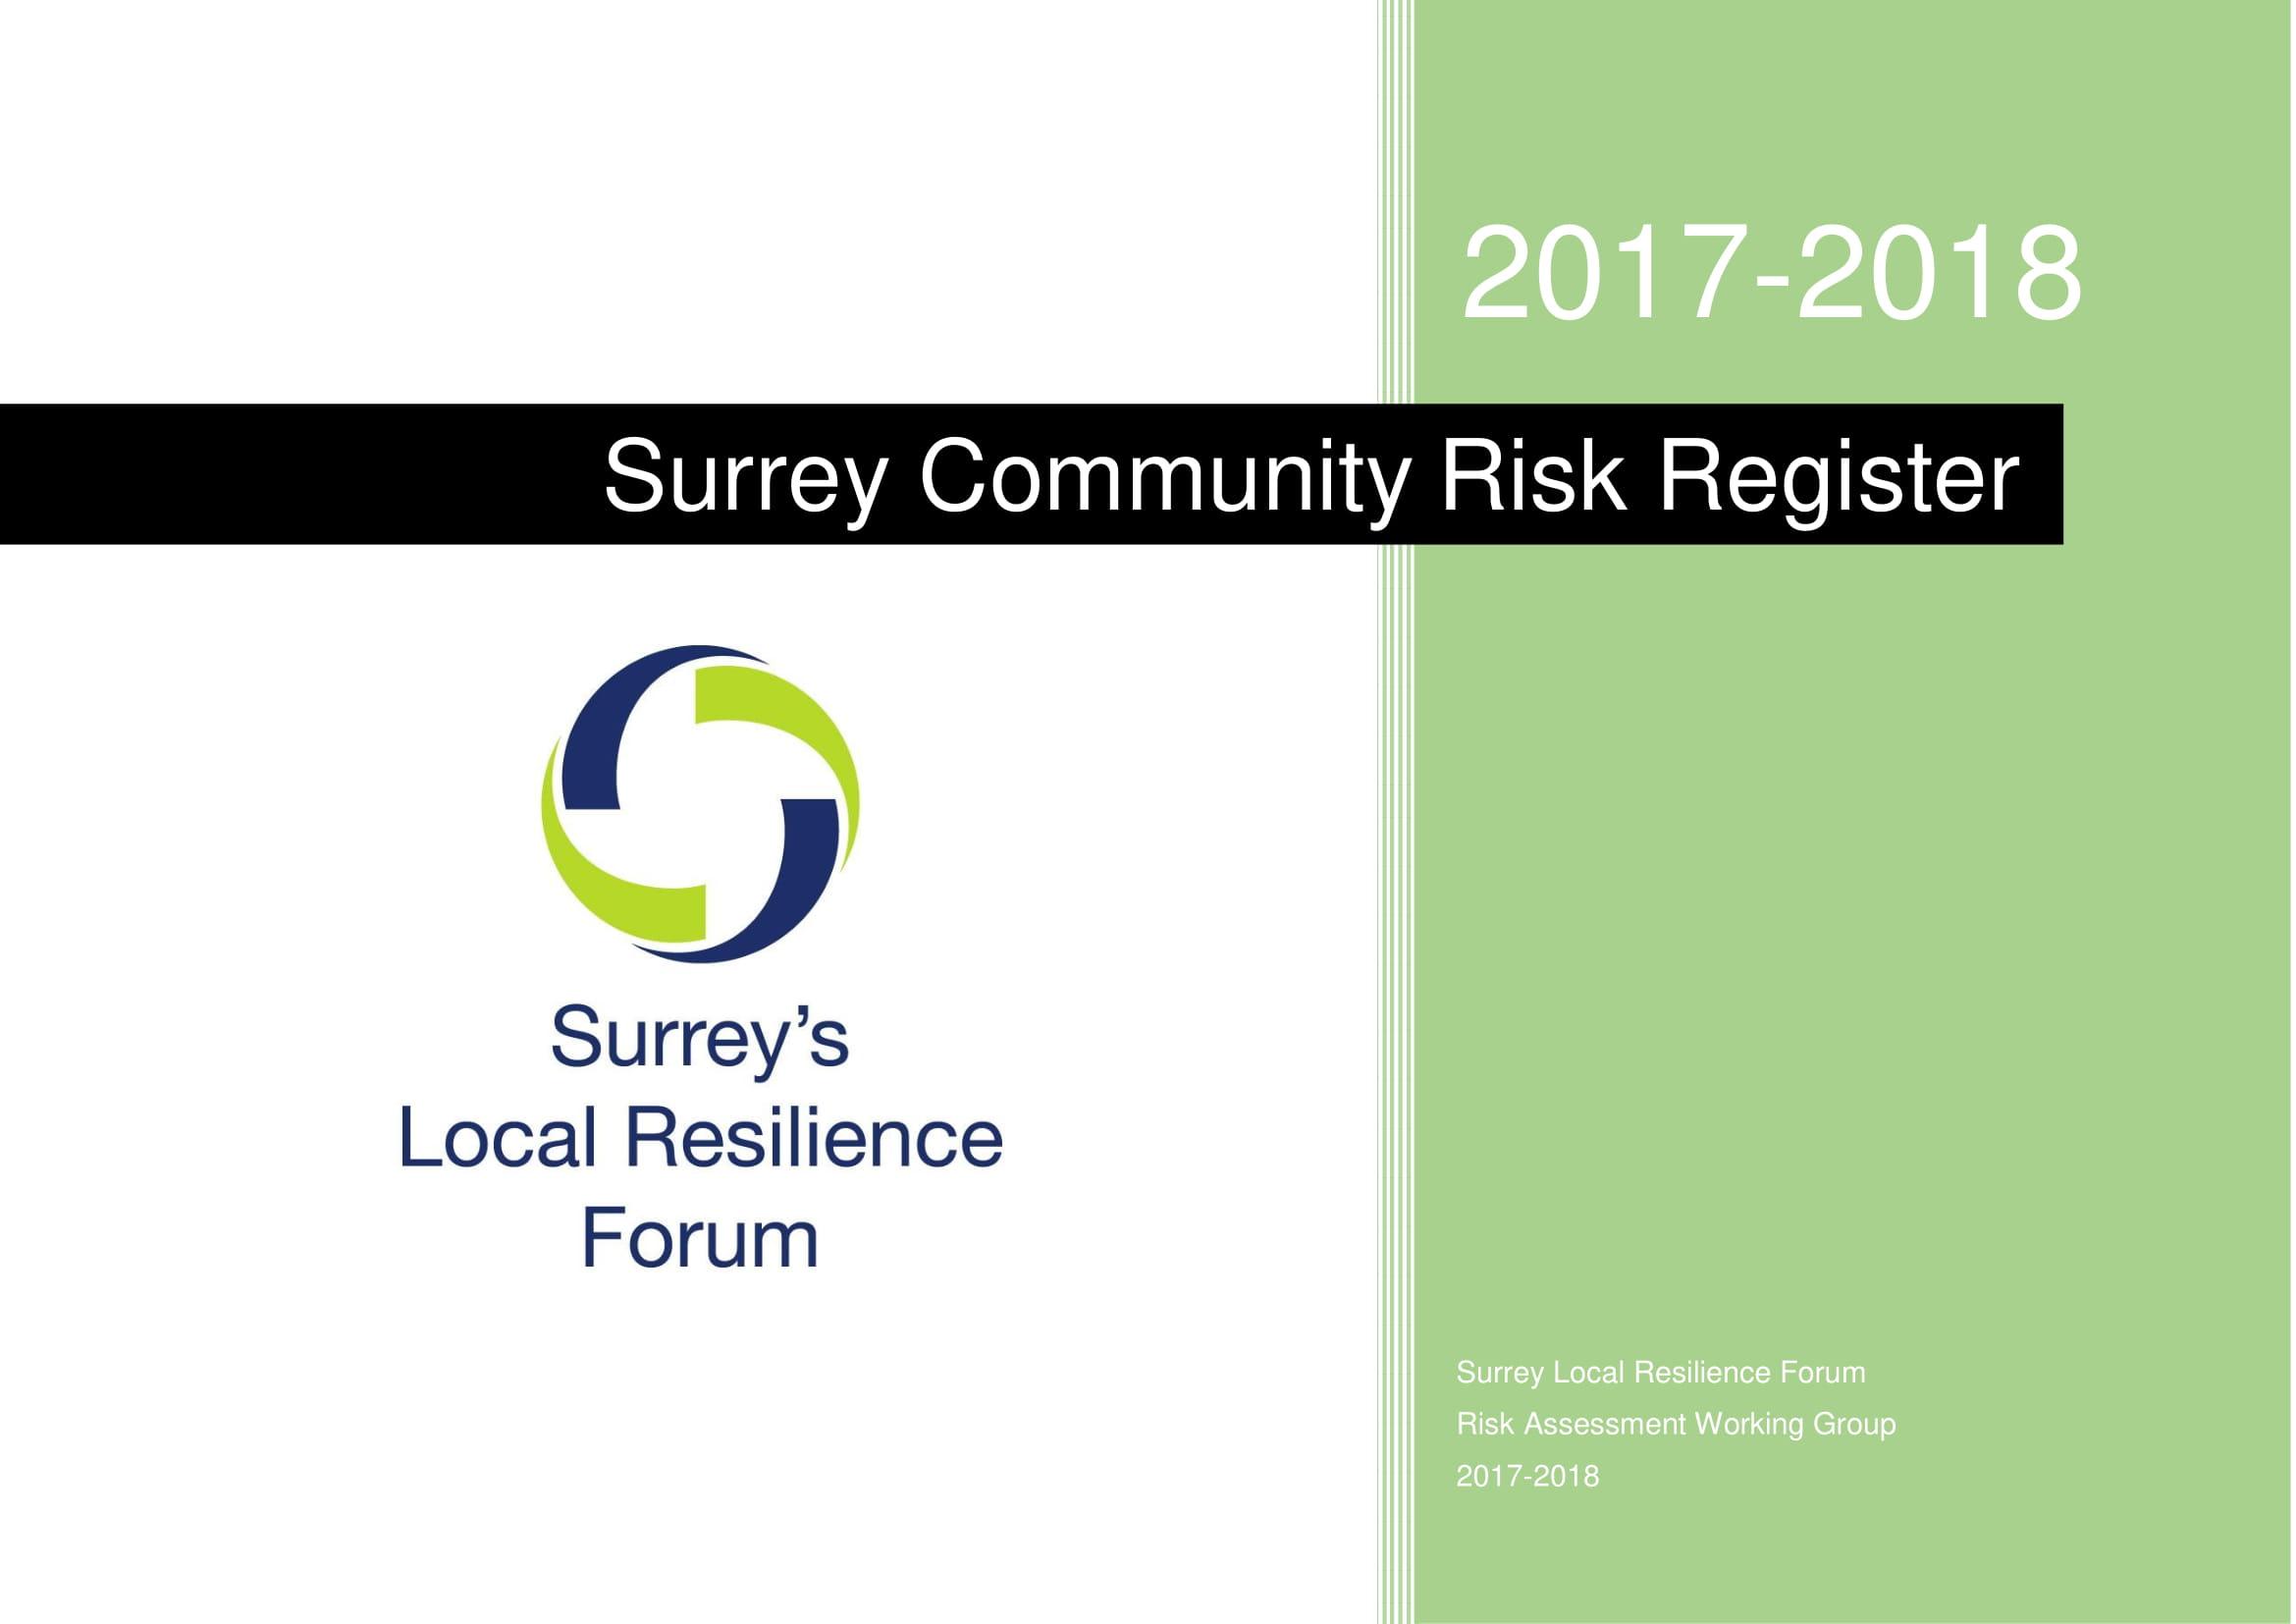 surrey community risk register example